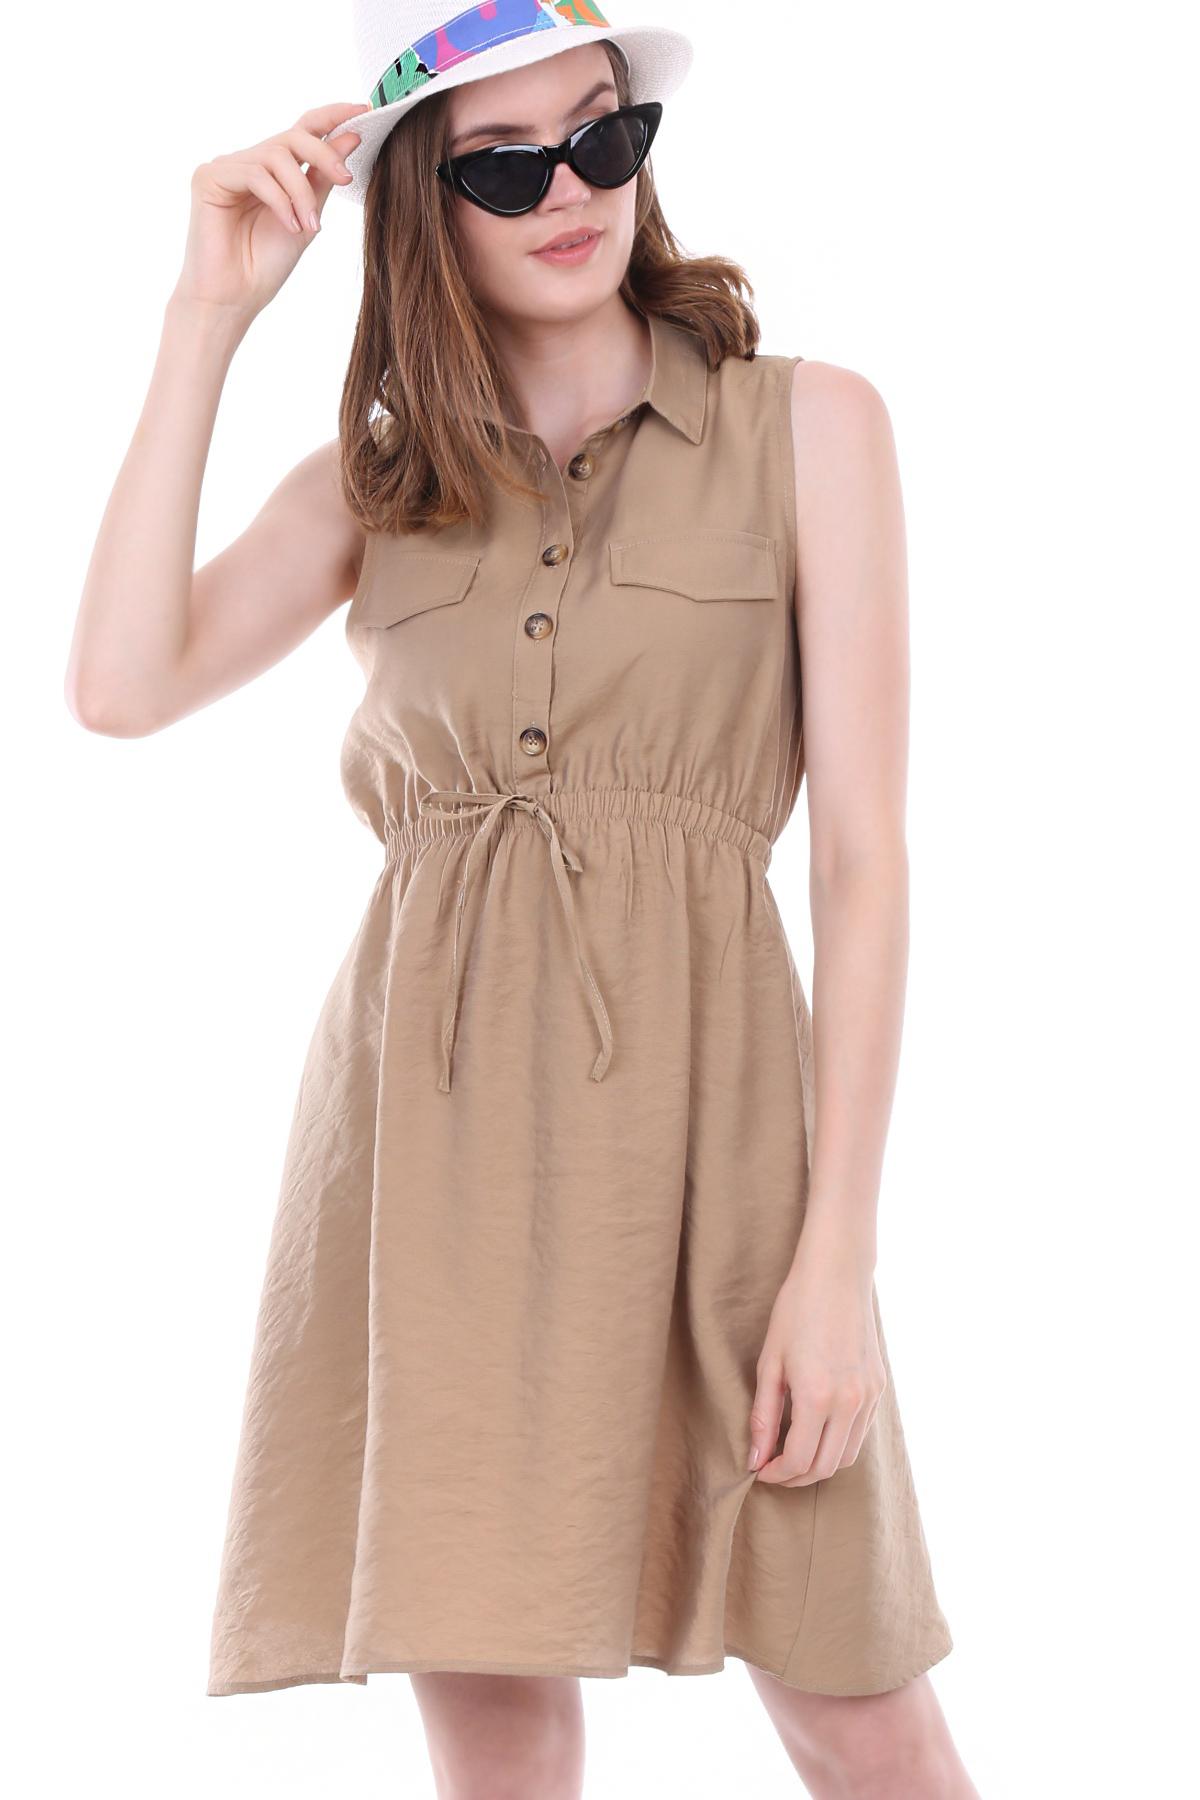 Women's Elastic Waist Sleeveless Dress